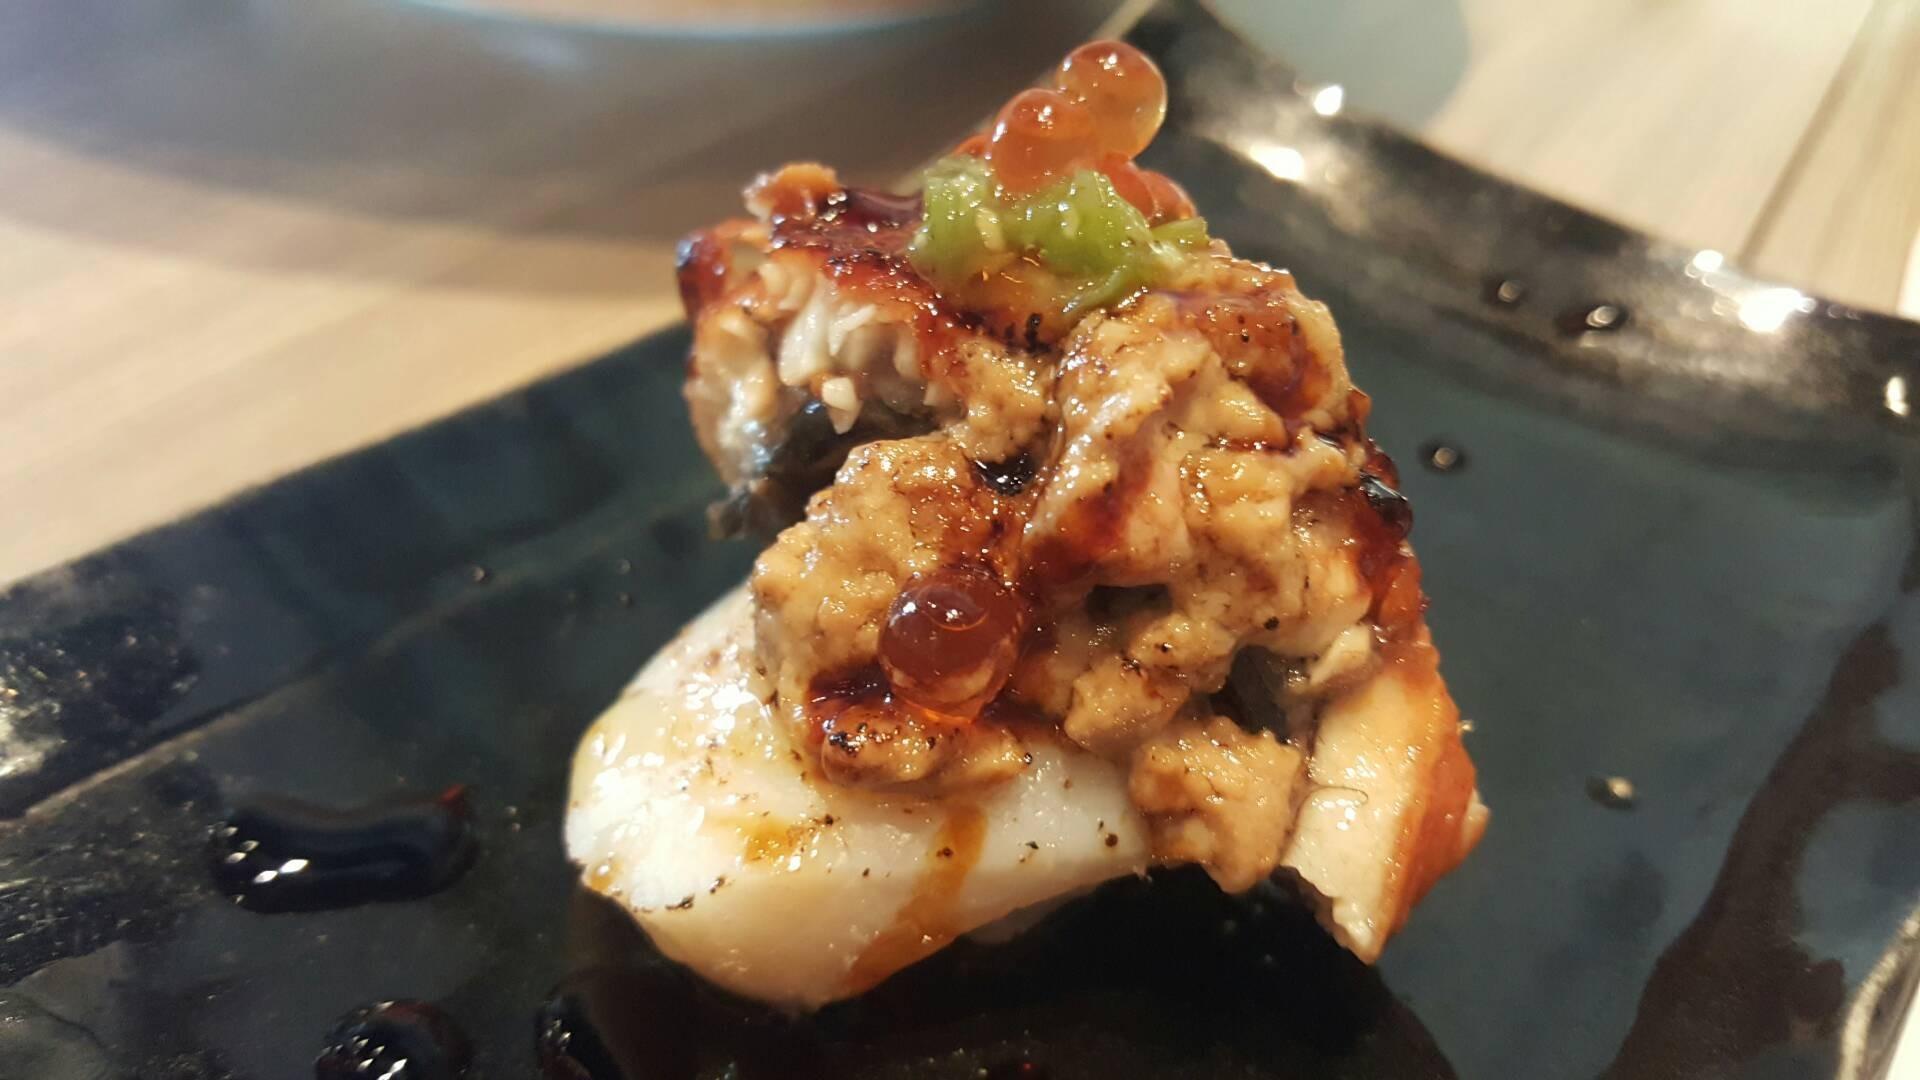 Hotate Unagi Foiegras Fusion : Hotate ชิ้นใหญ่ดี เนื้อปลาไหลหอมๆหวาน Foeigras หว